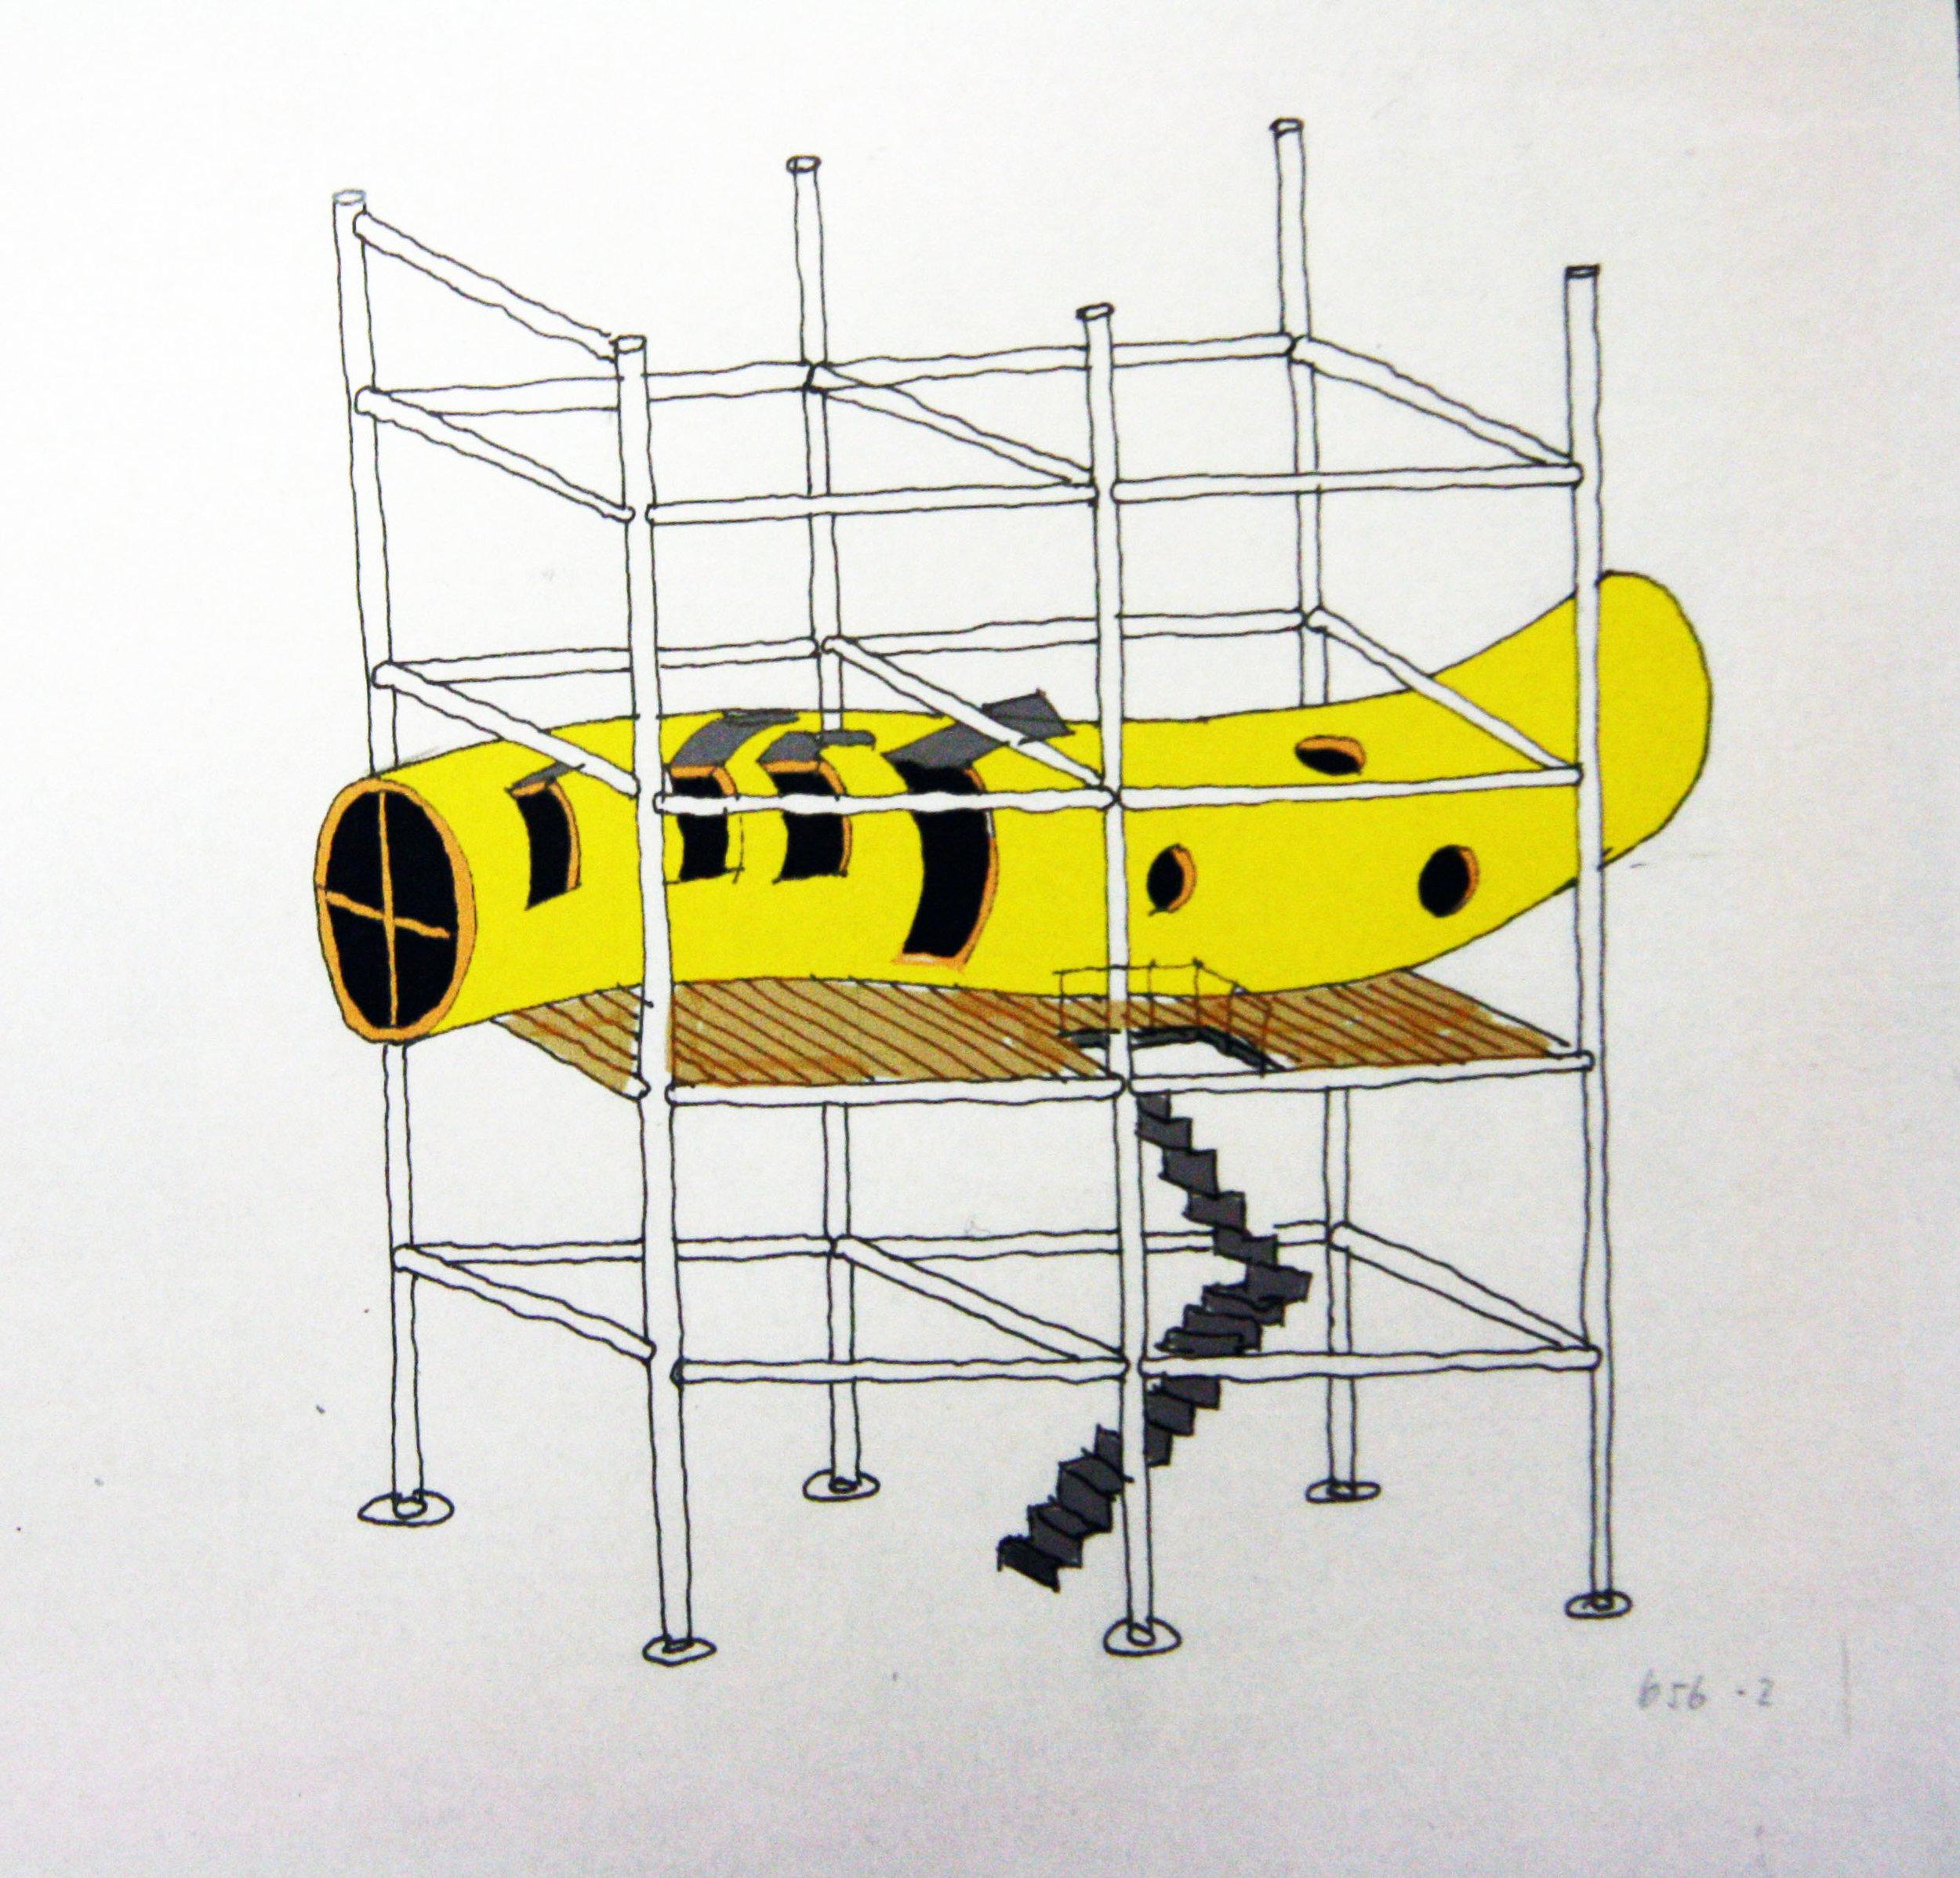 KokerVista | Wim Kol